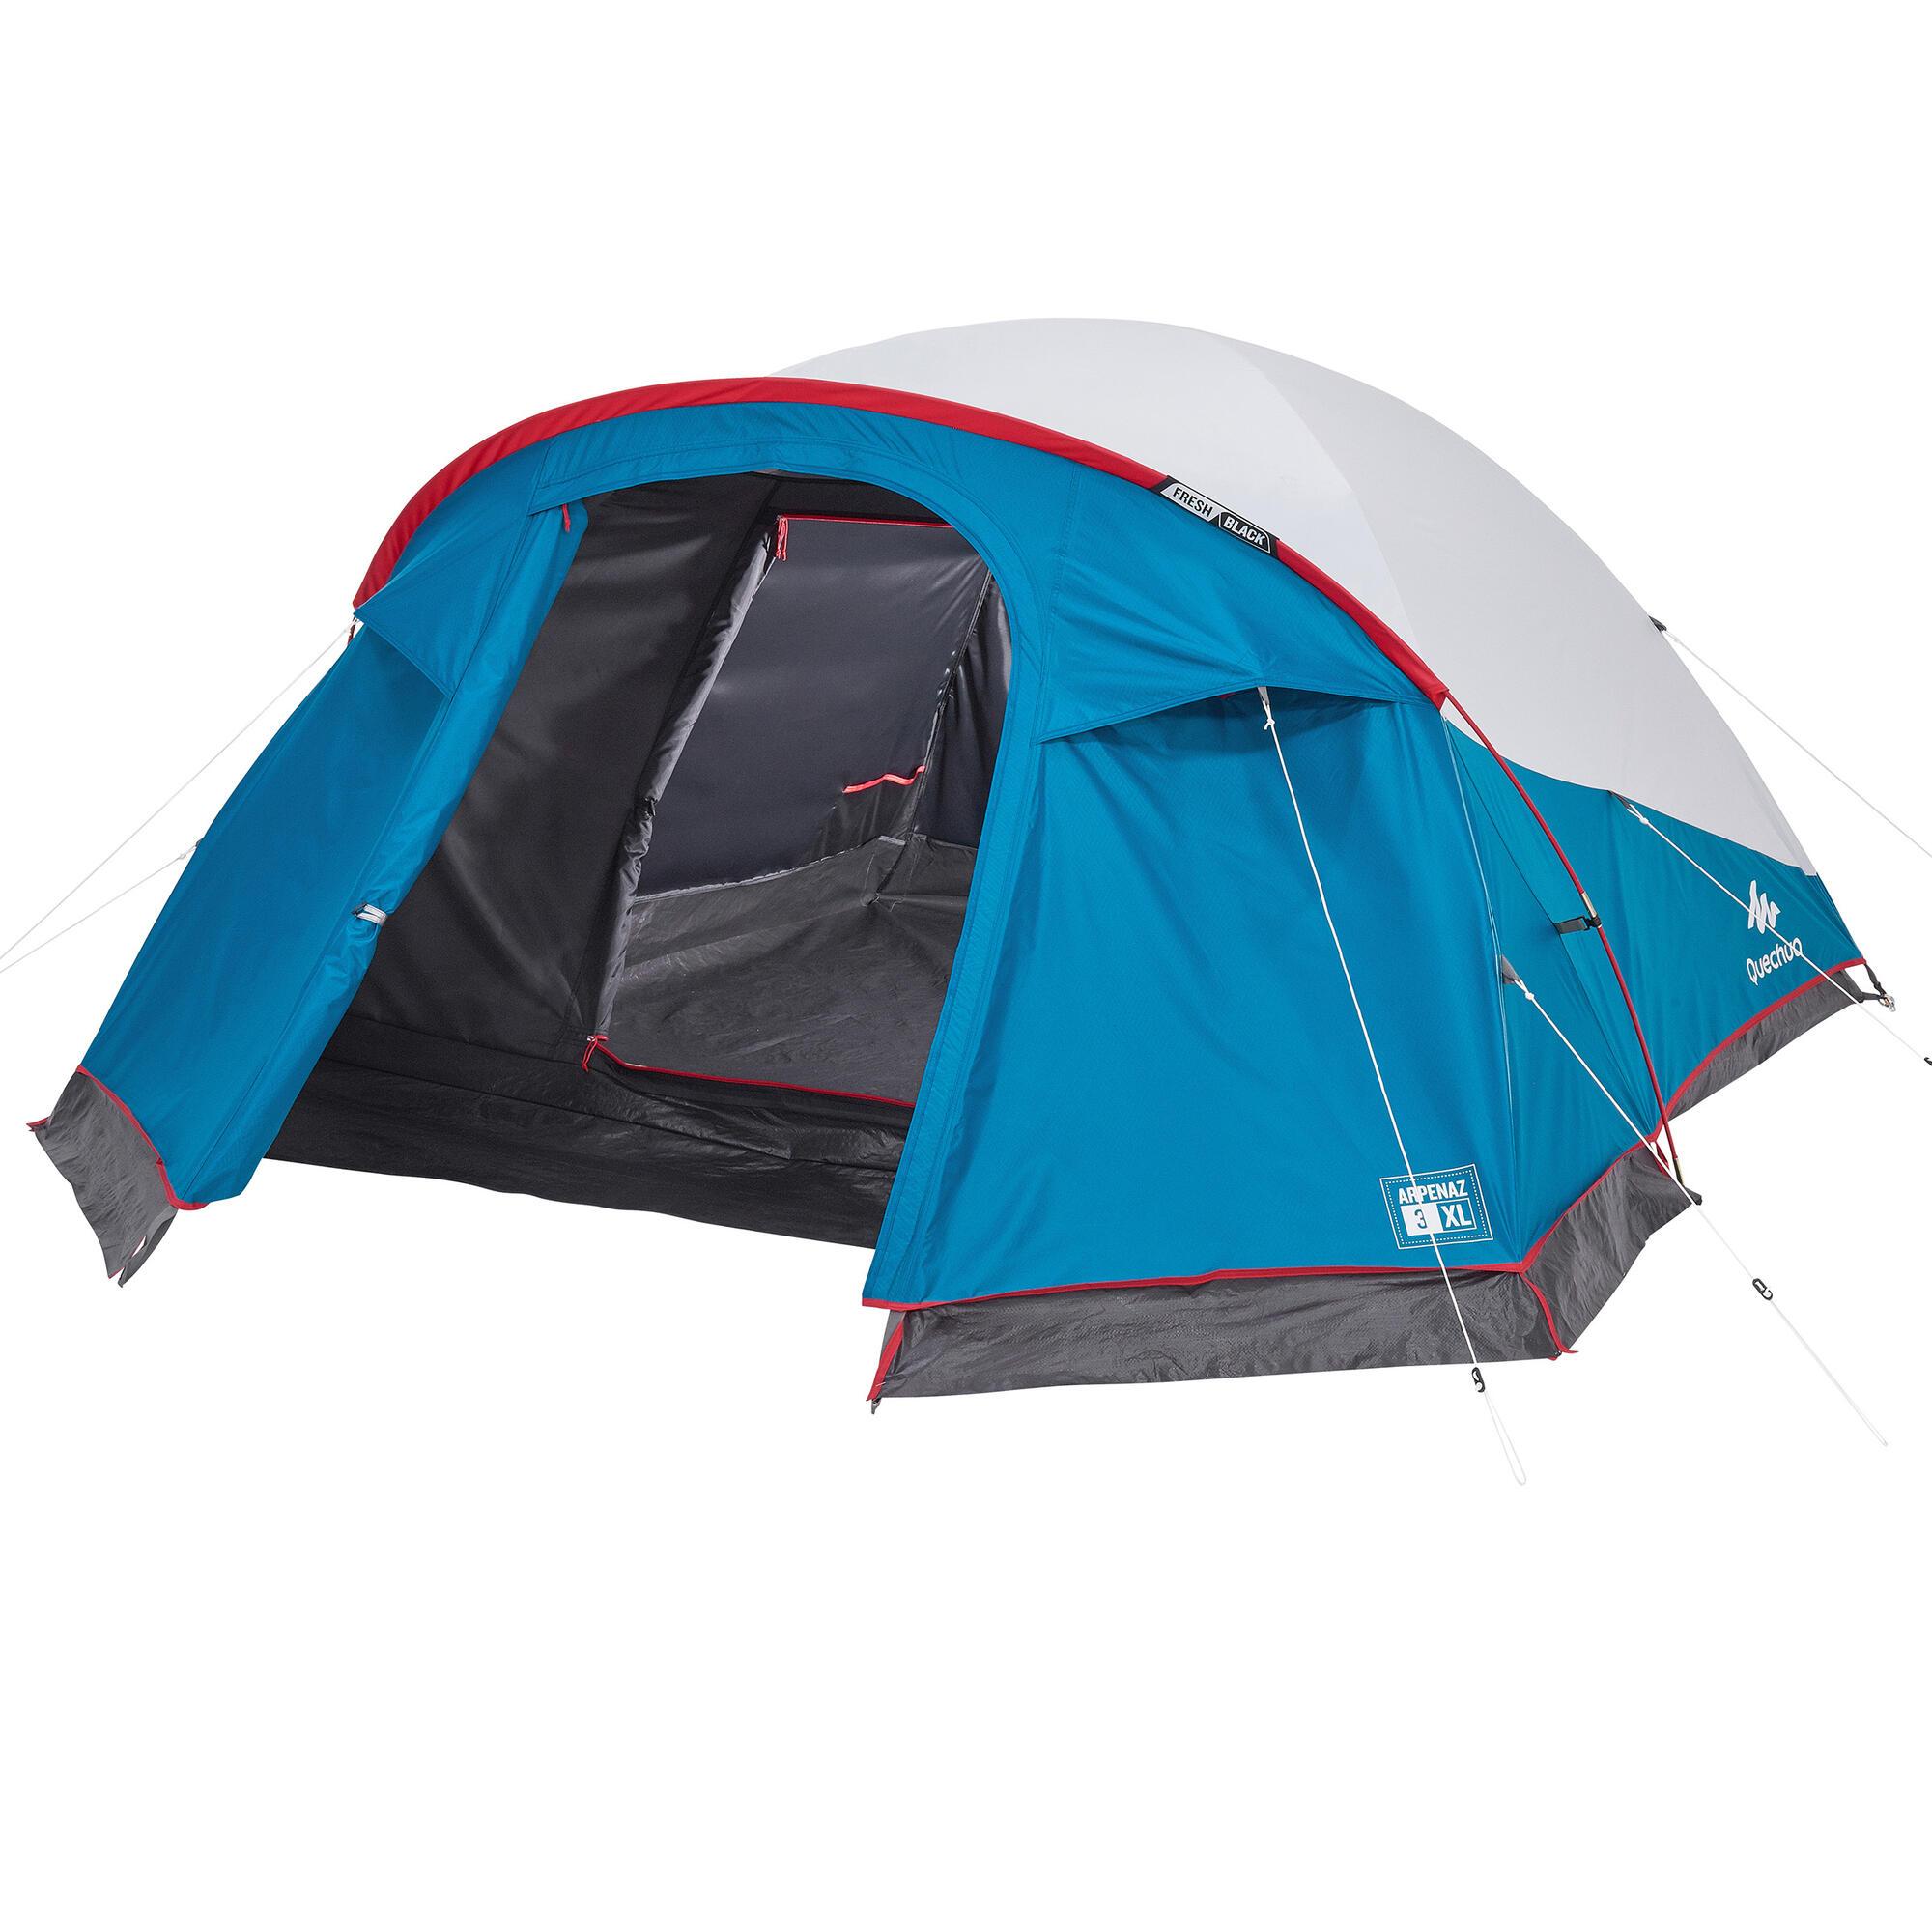 tenda campeggio arpenaz 3 xl fresh black 3 posti quechua. Black Bedroom Furniture Sets. Home Design Ideas